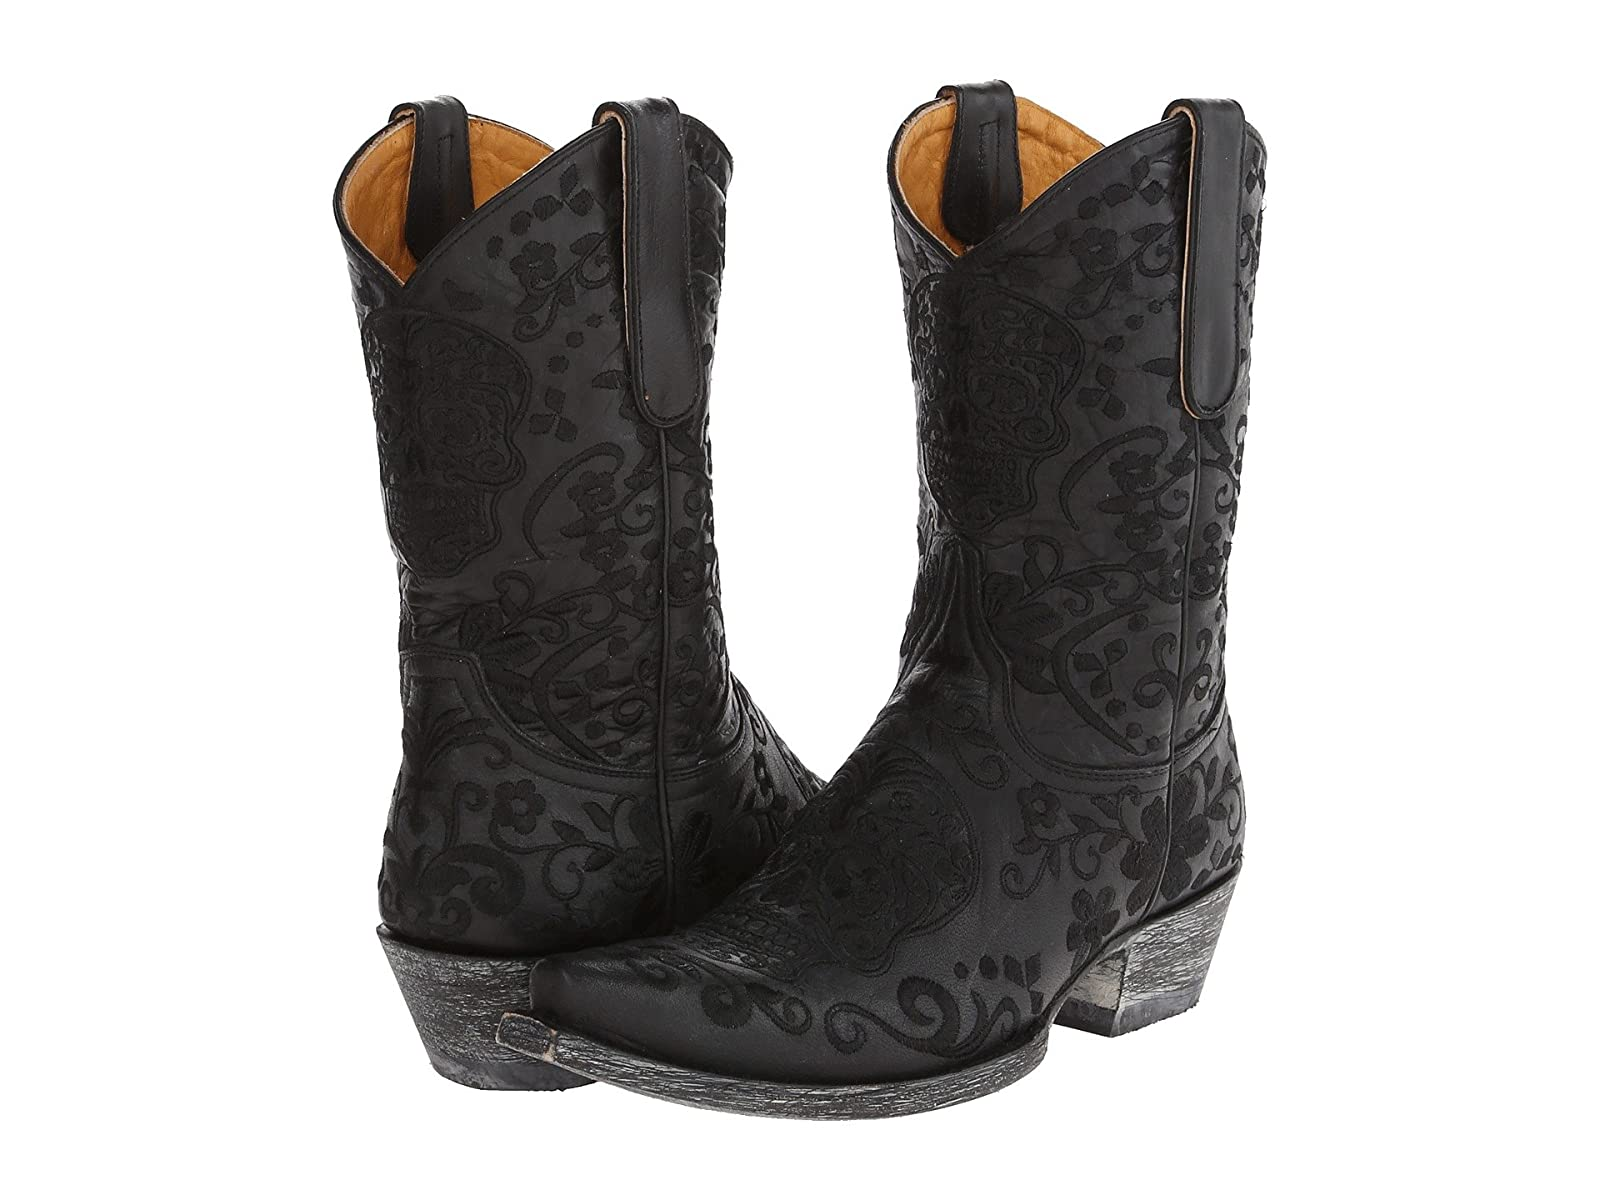 Old Gringo KlakEconomical and quality shoes